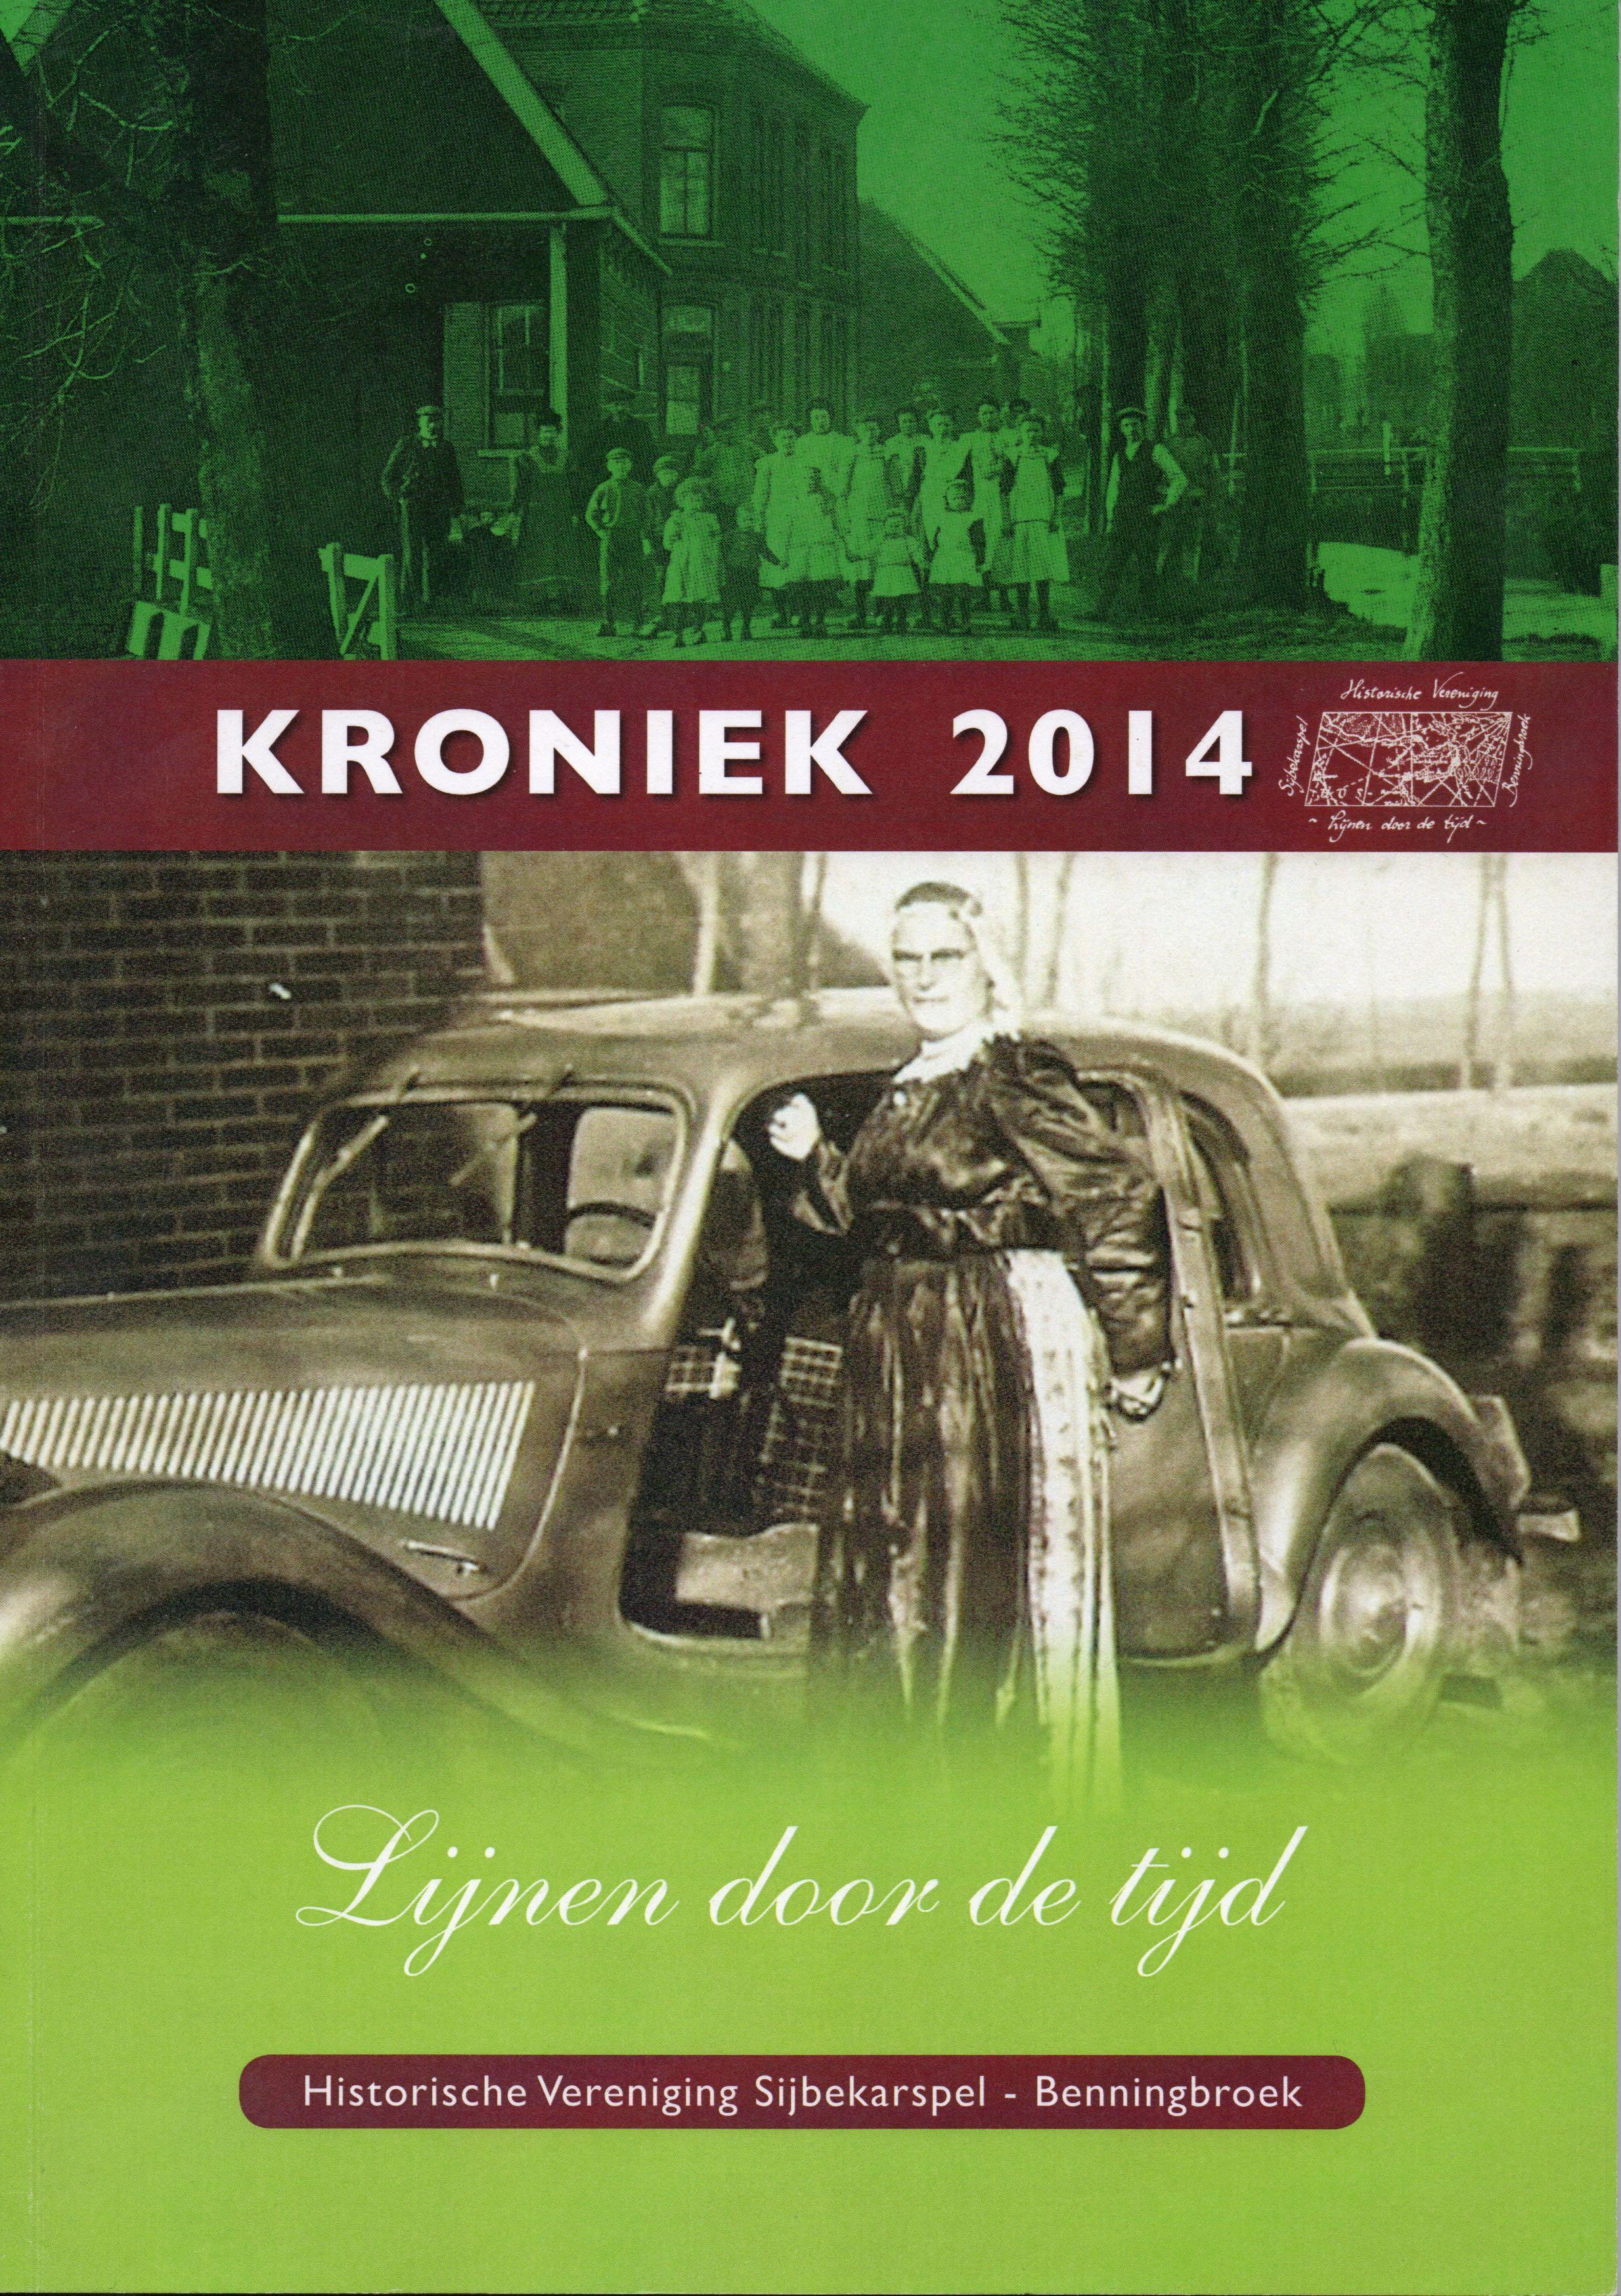 kroniek-2014